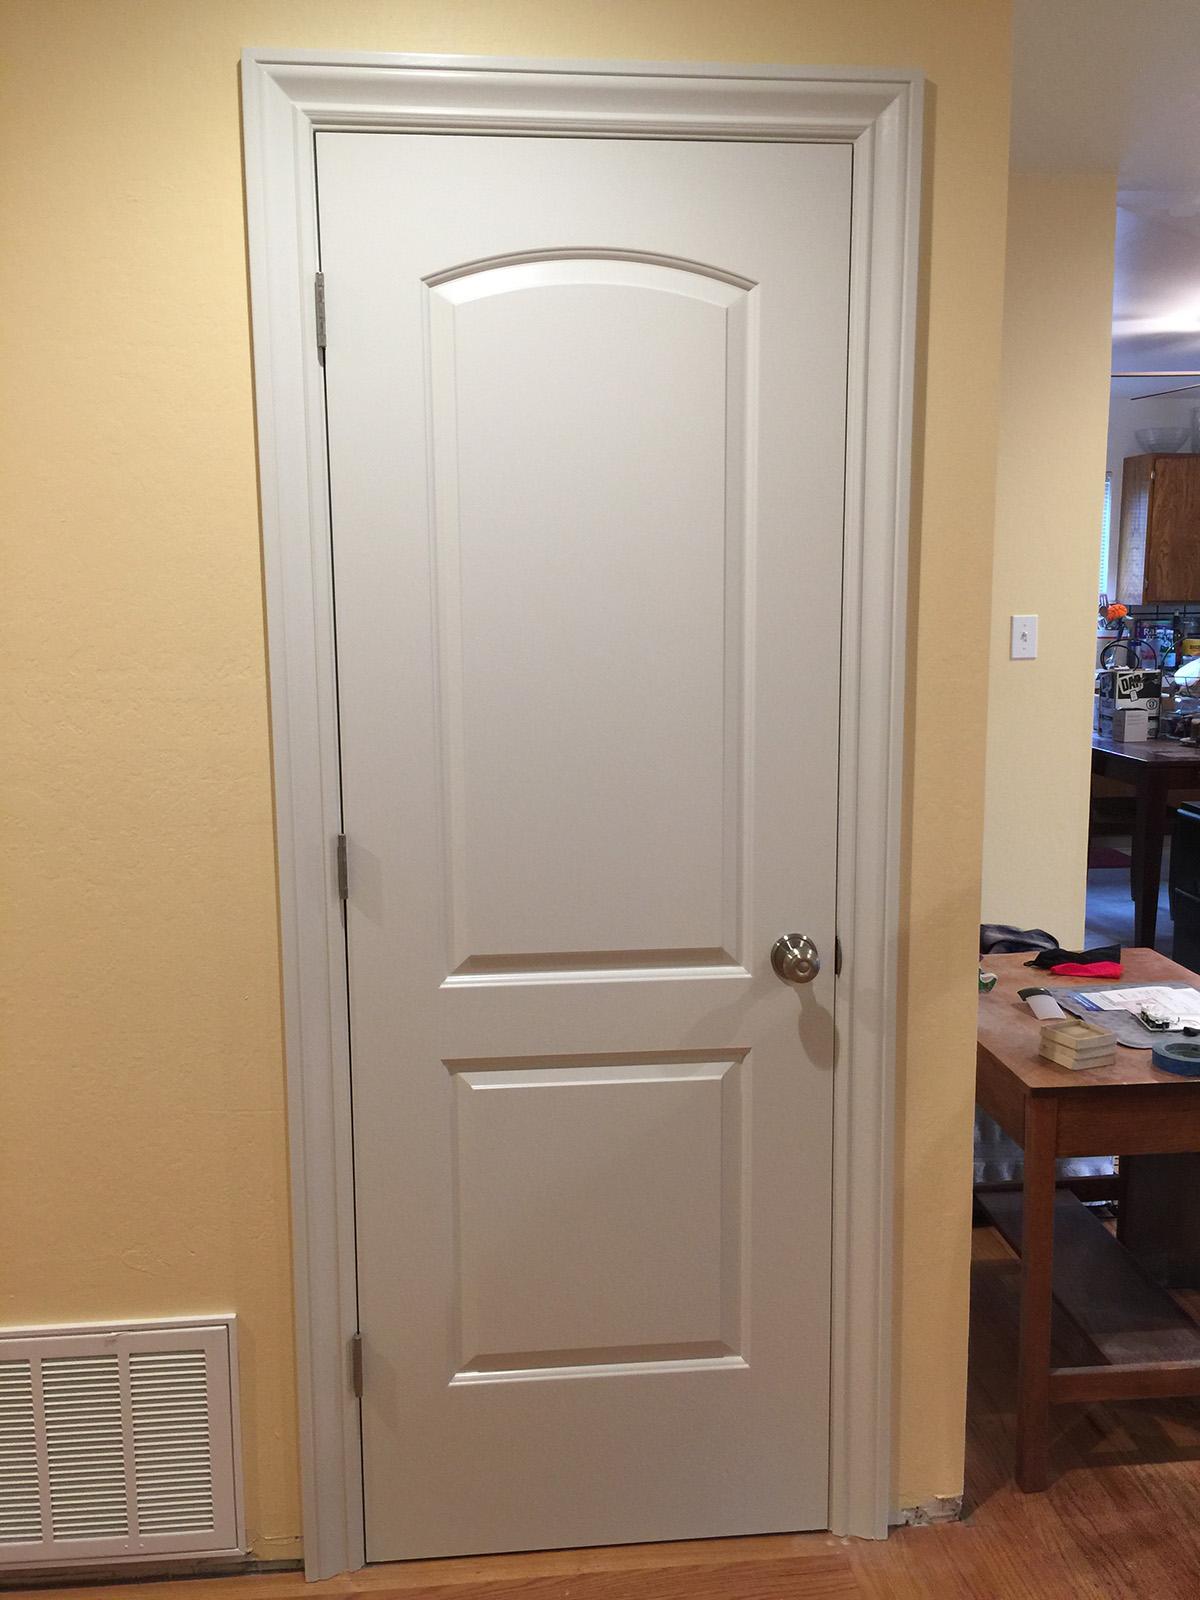 Interior Fremont CA Replacement Windows And Doors